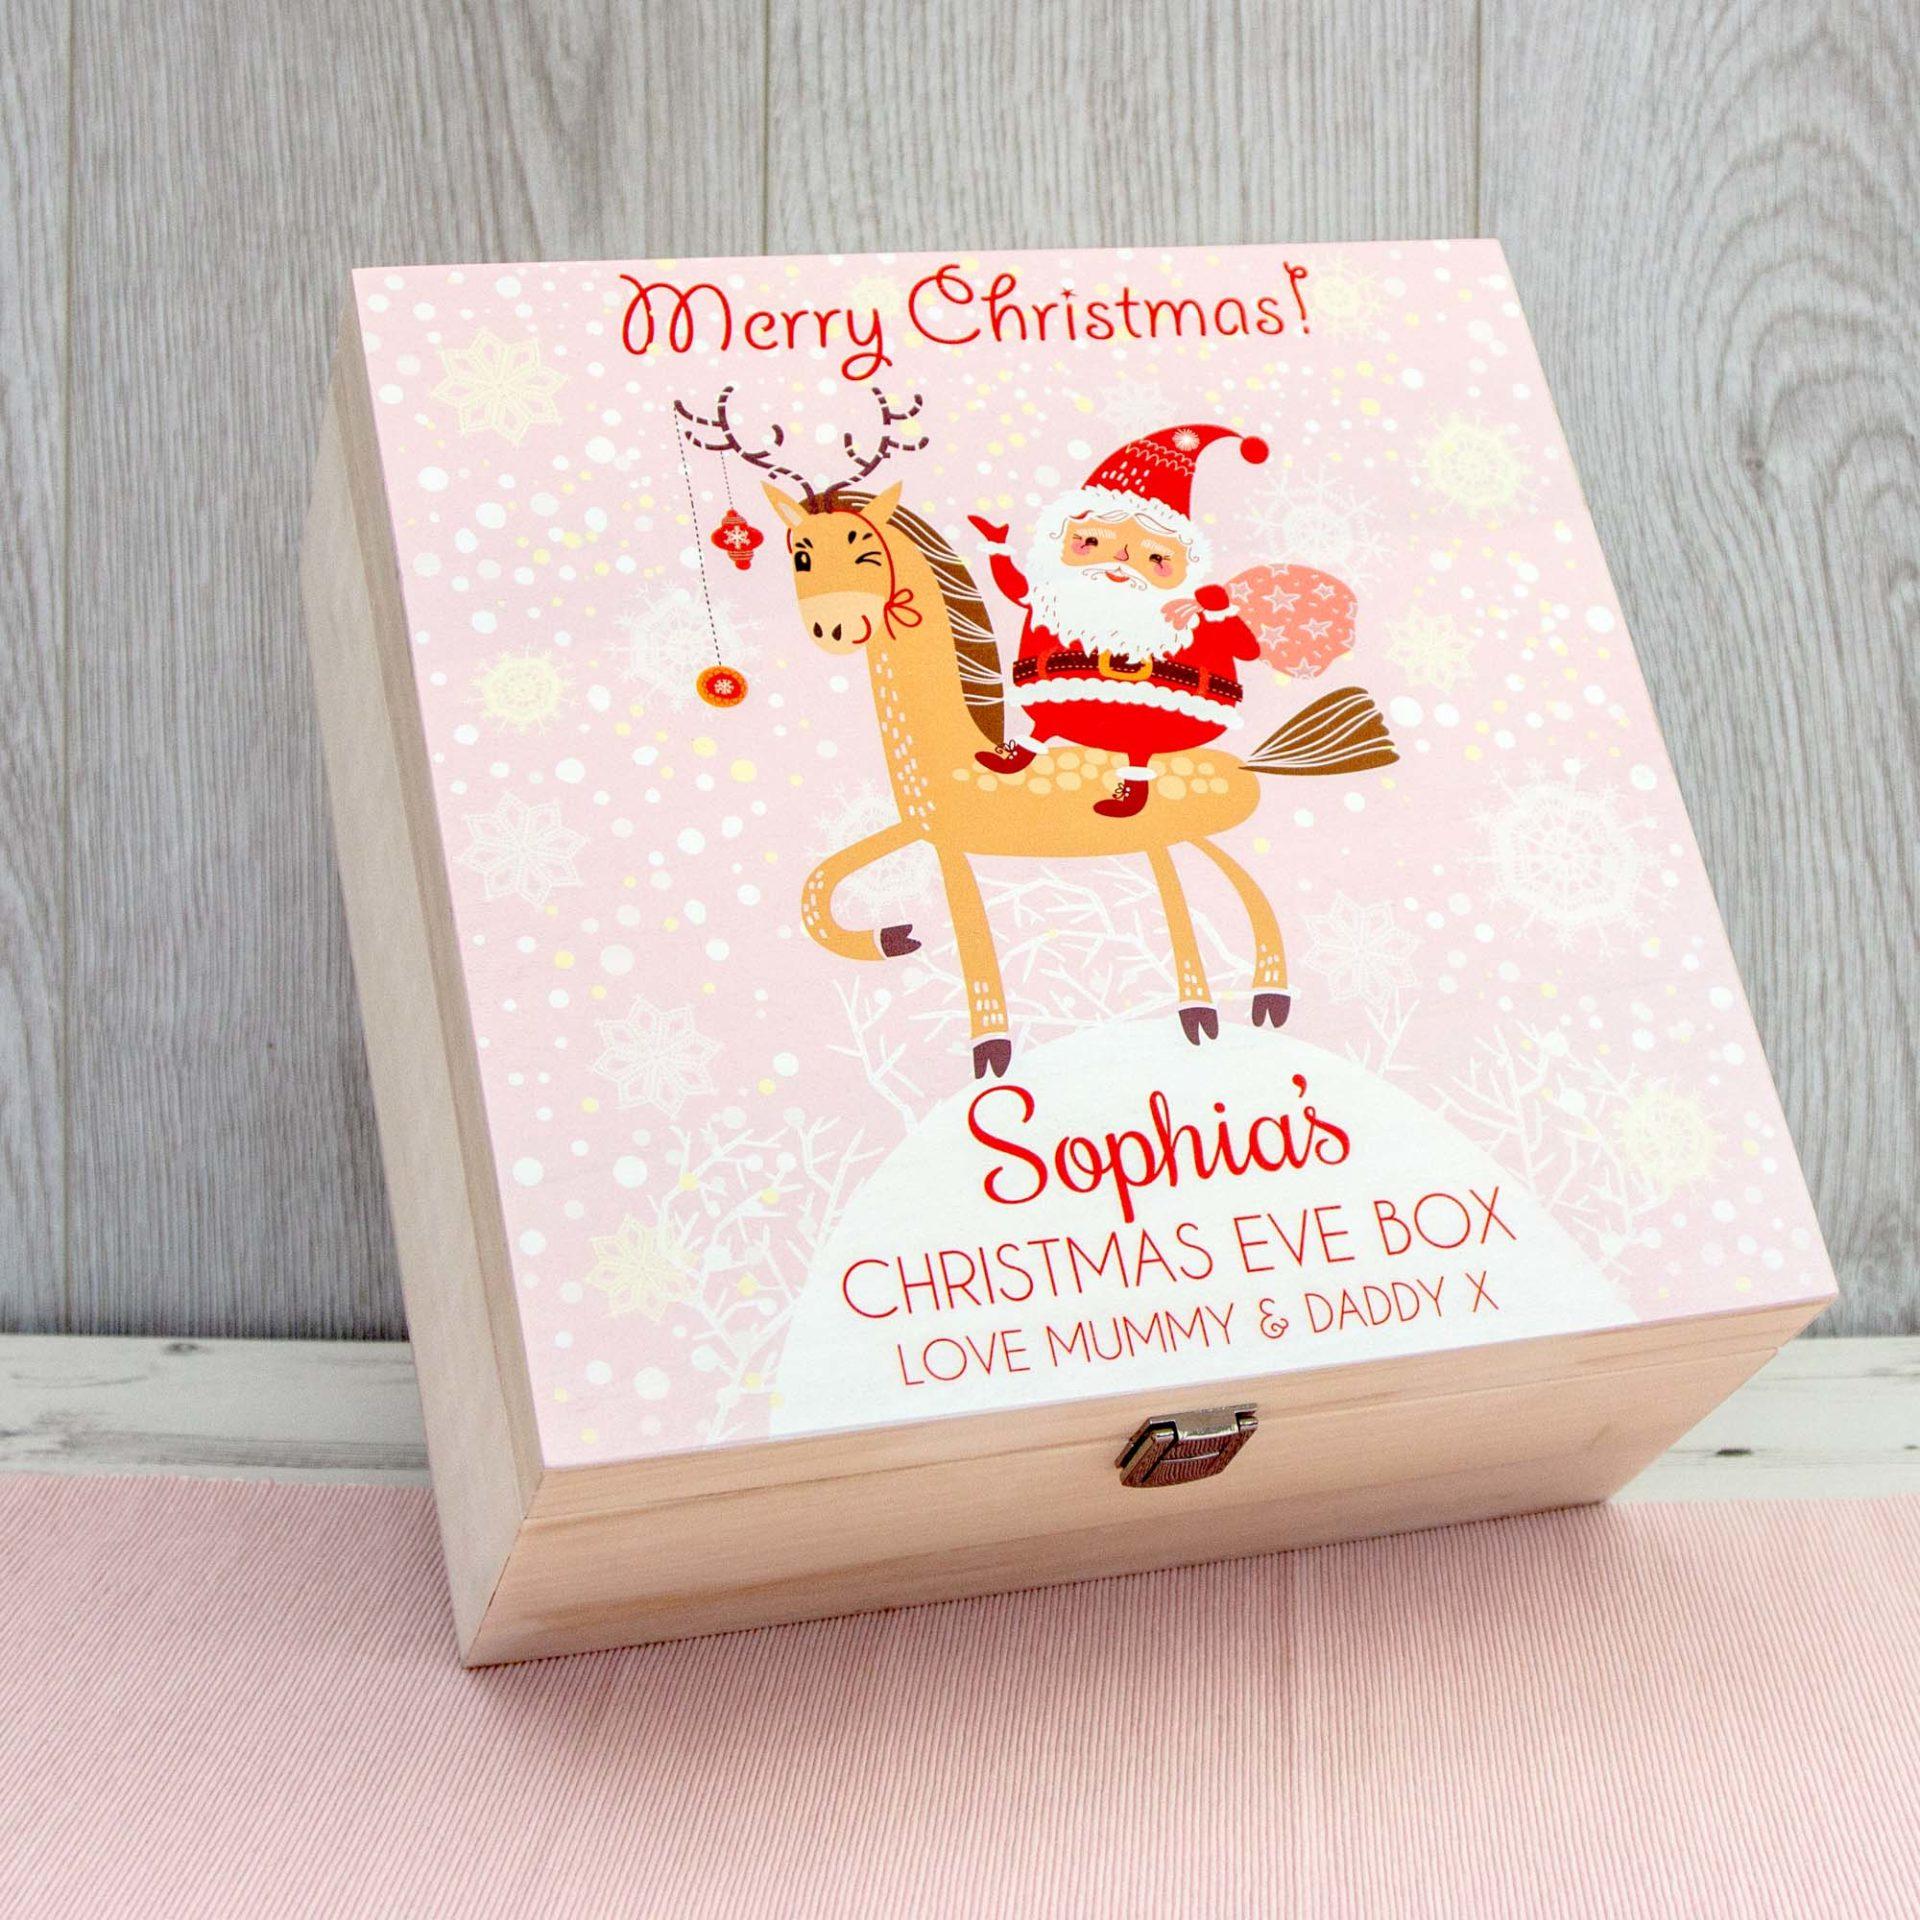 Christmas Eve Box Pink Santa & Rudolph Early Bird Offer